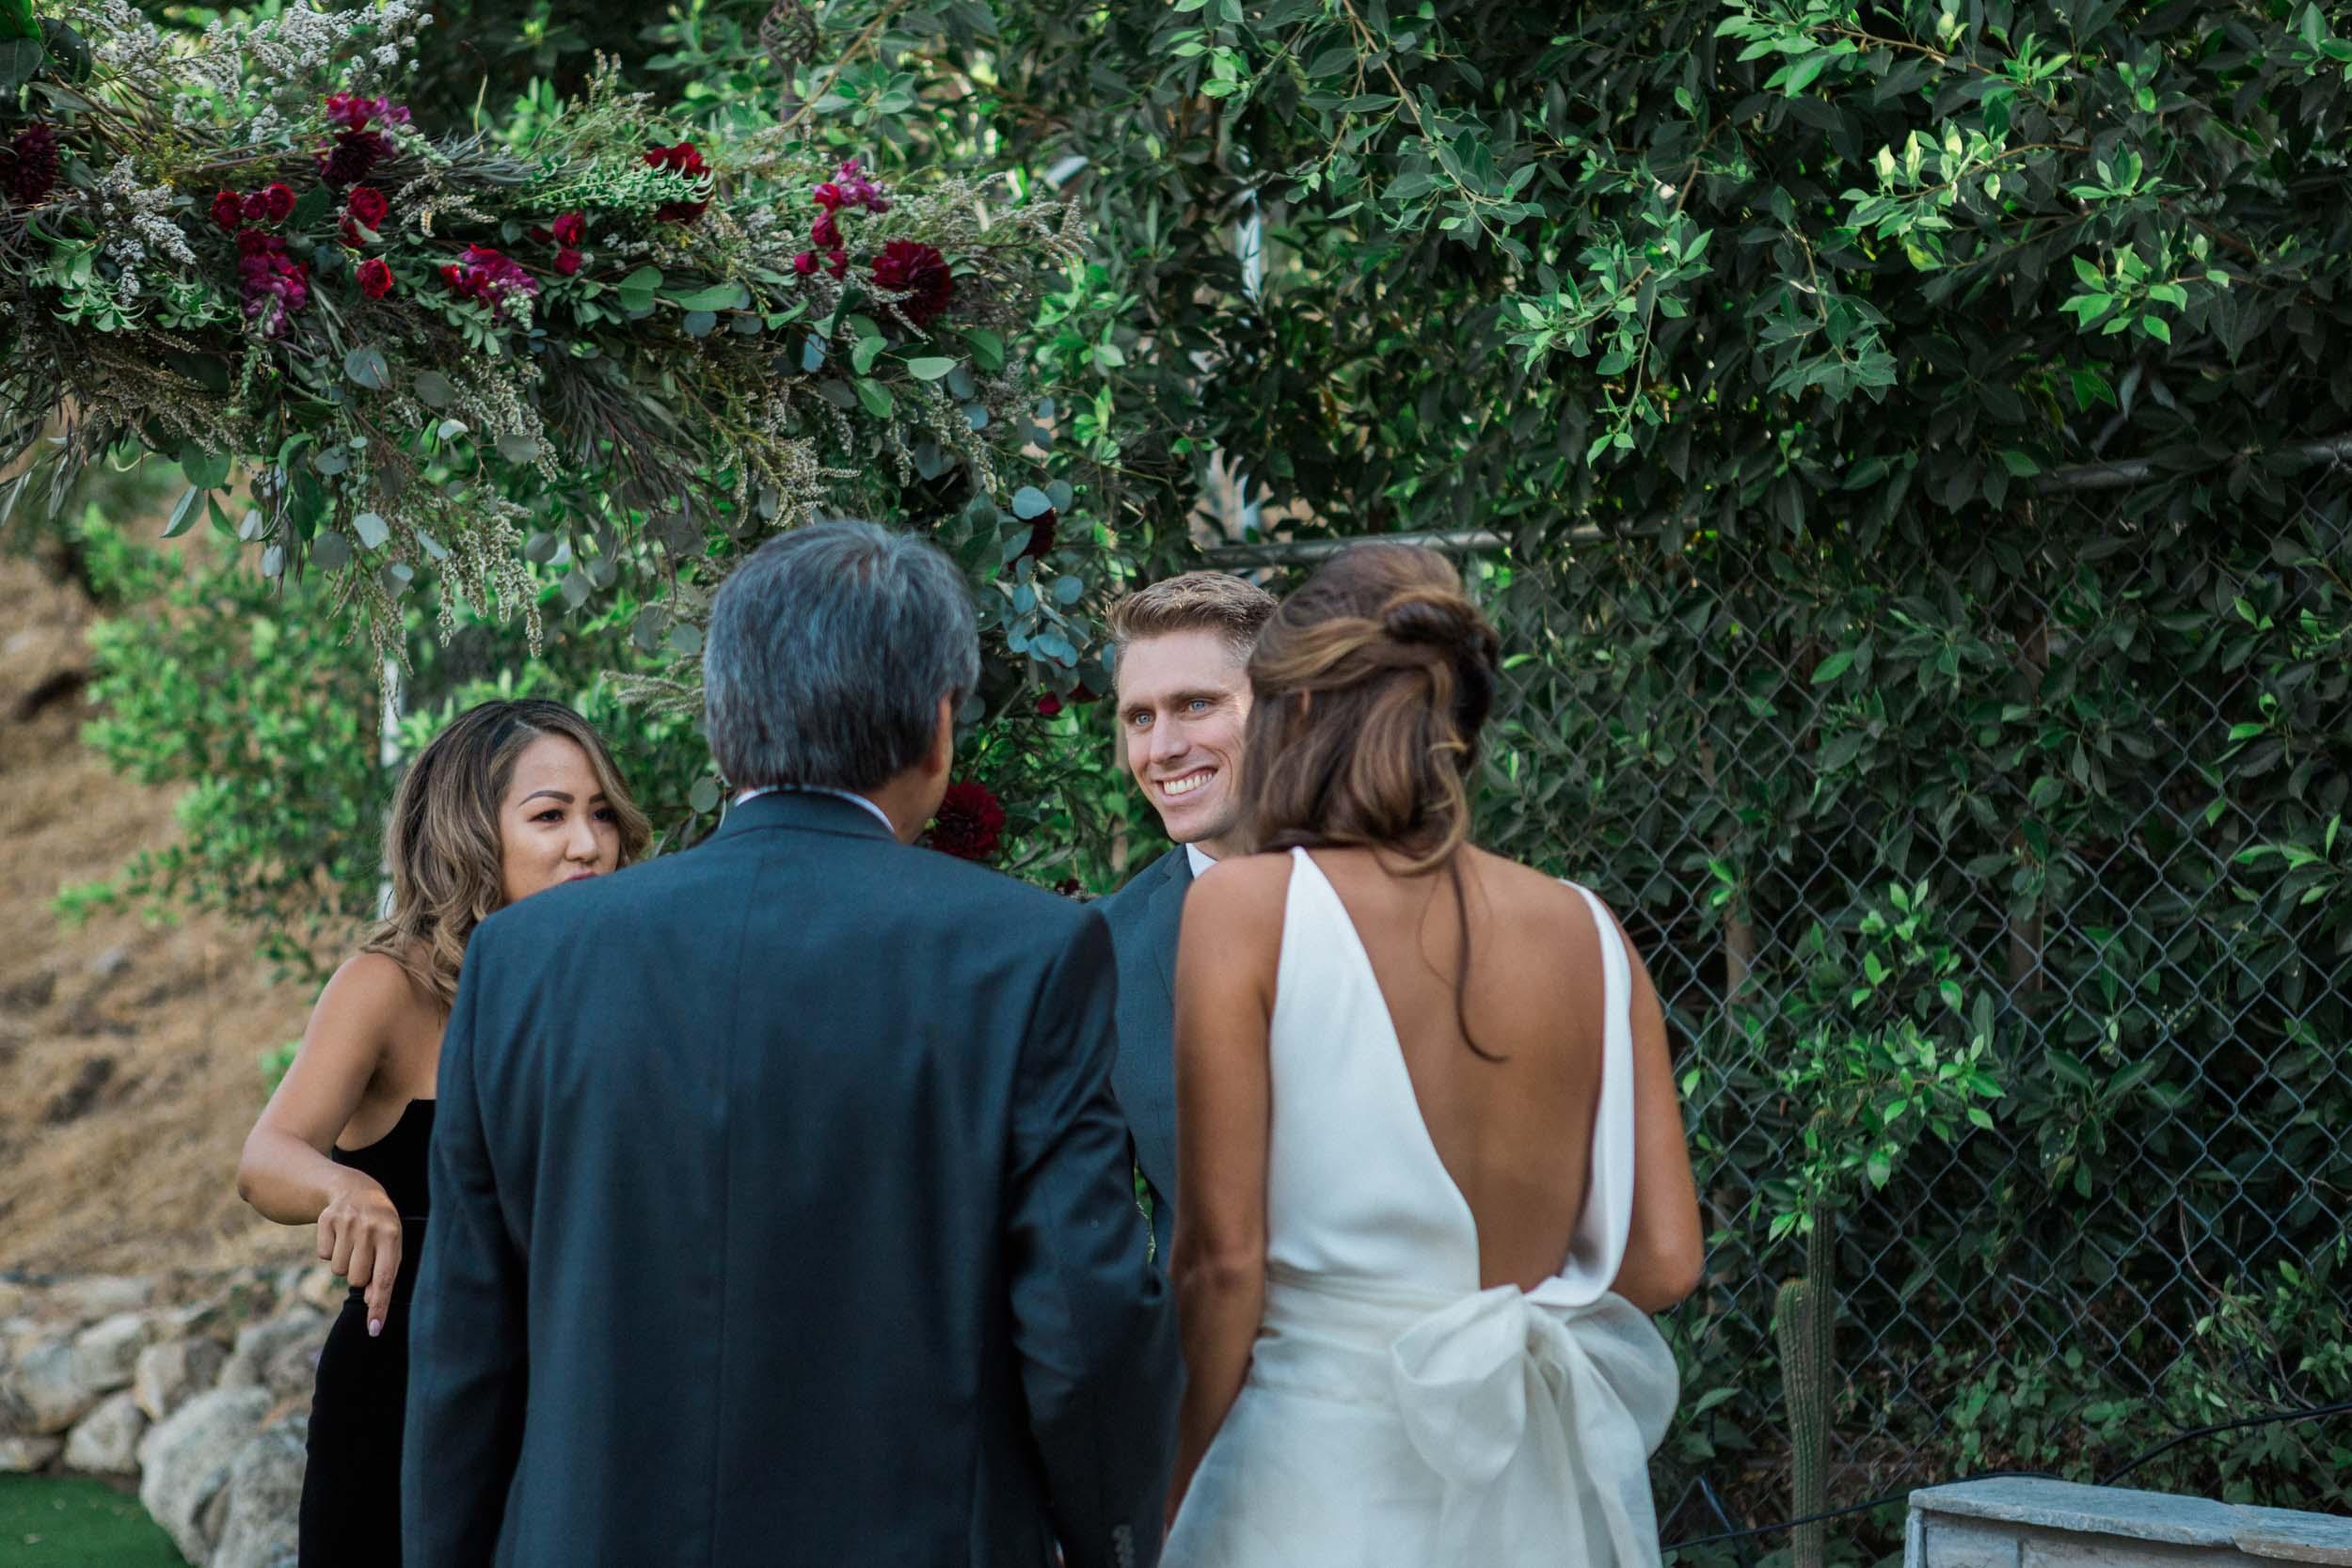 BKM-Photography-Highland-Park-Los-Angeles-Backyard-Wedding-0025.jpg